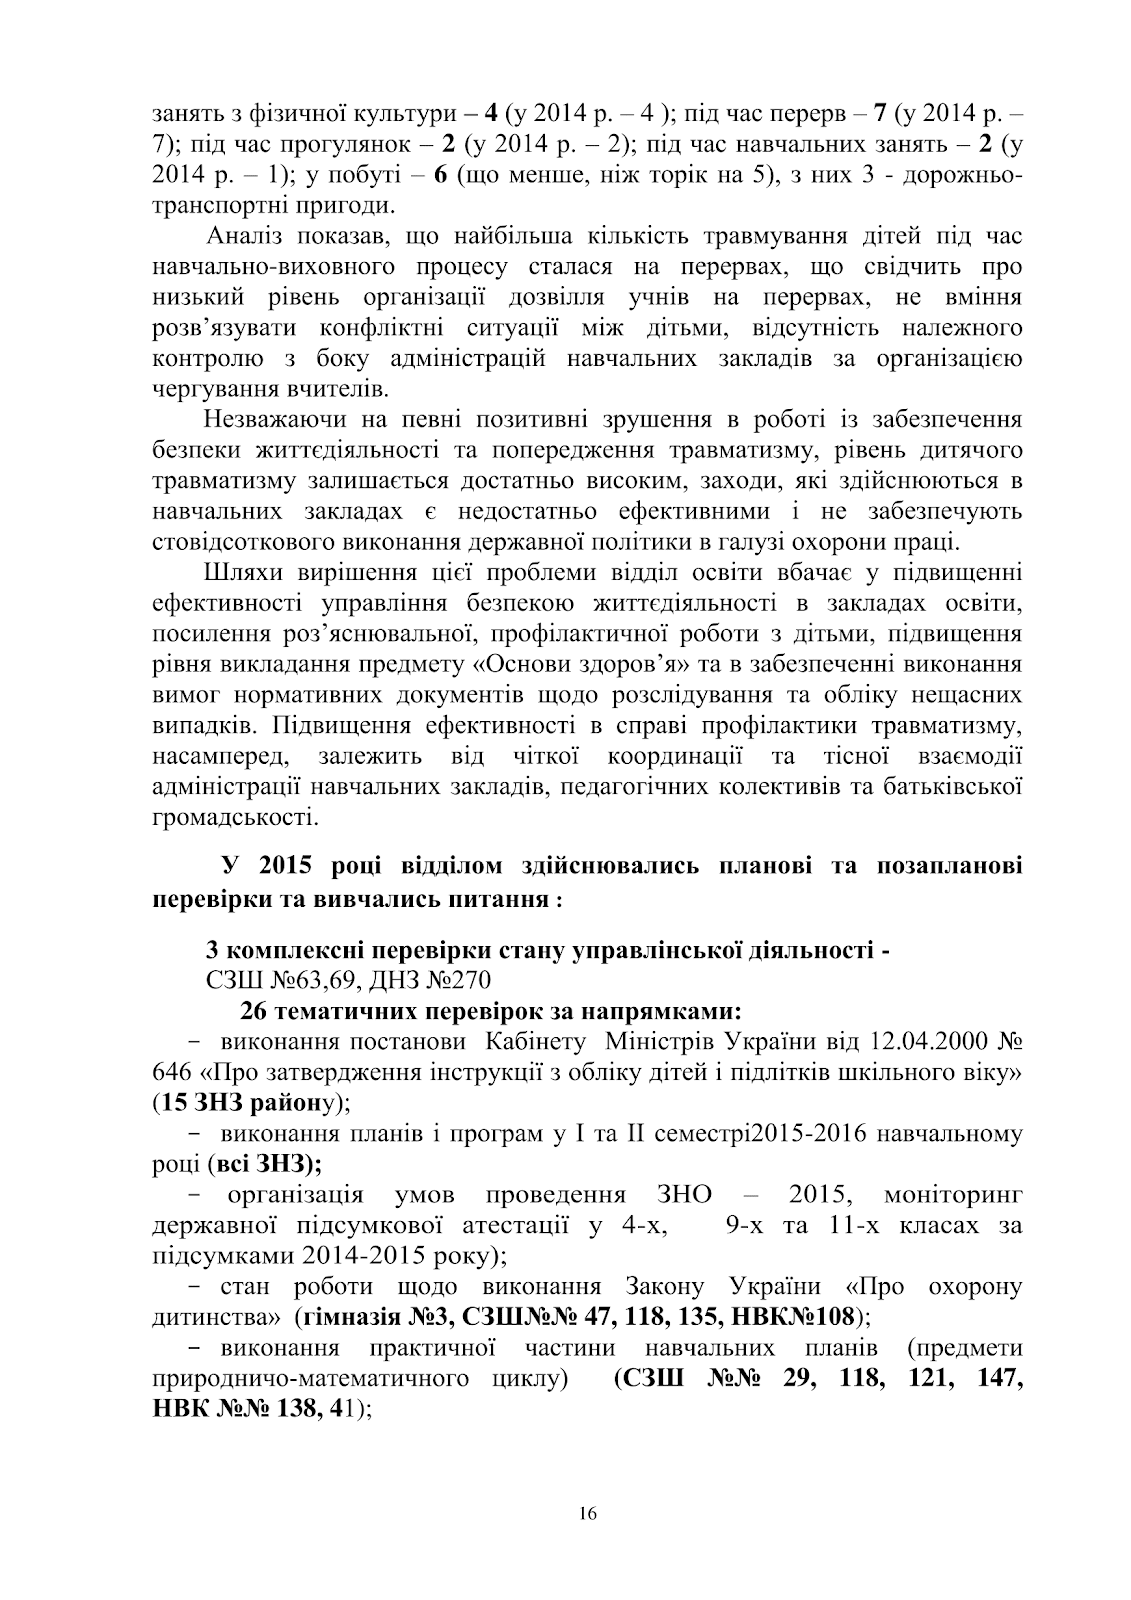 C:\Users\Валерия\Desktop\план 2016 рік\план 2016 рік-016.png